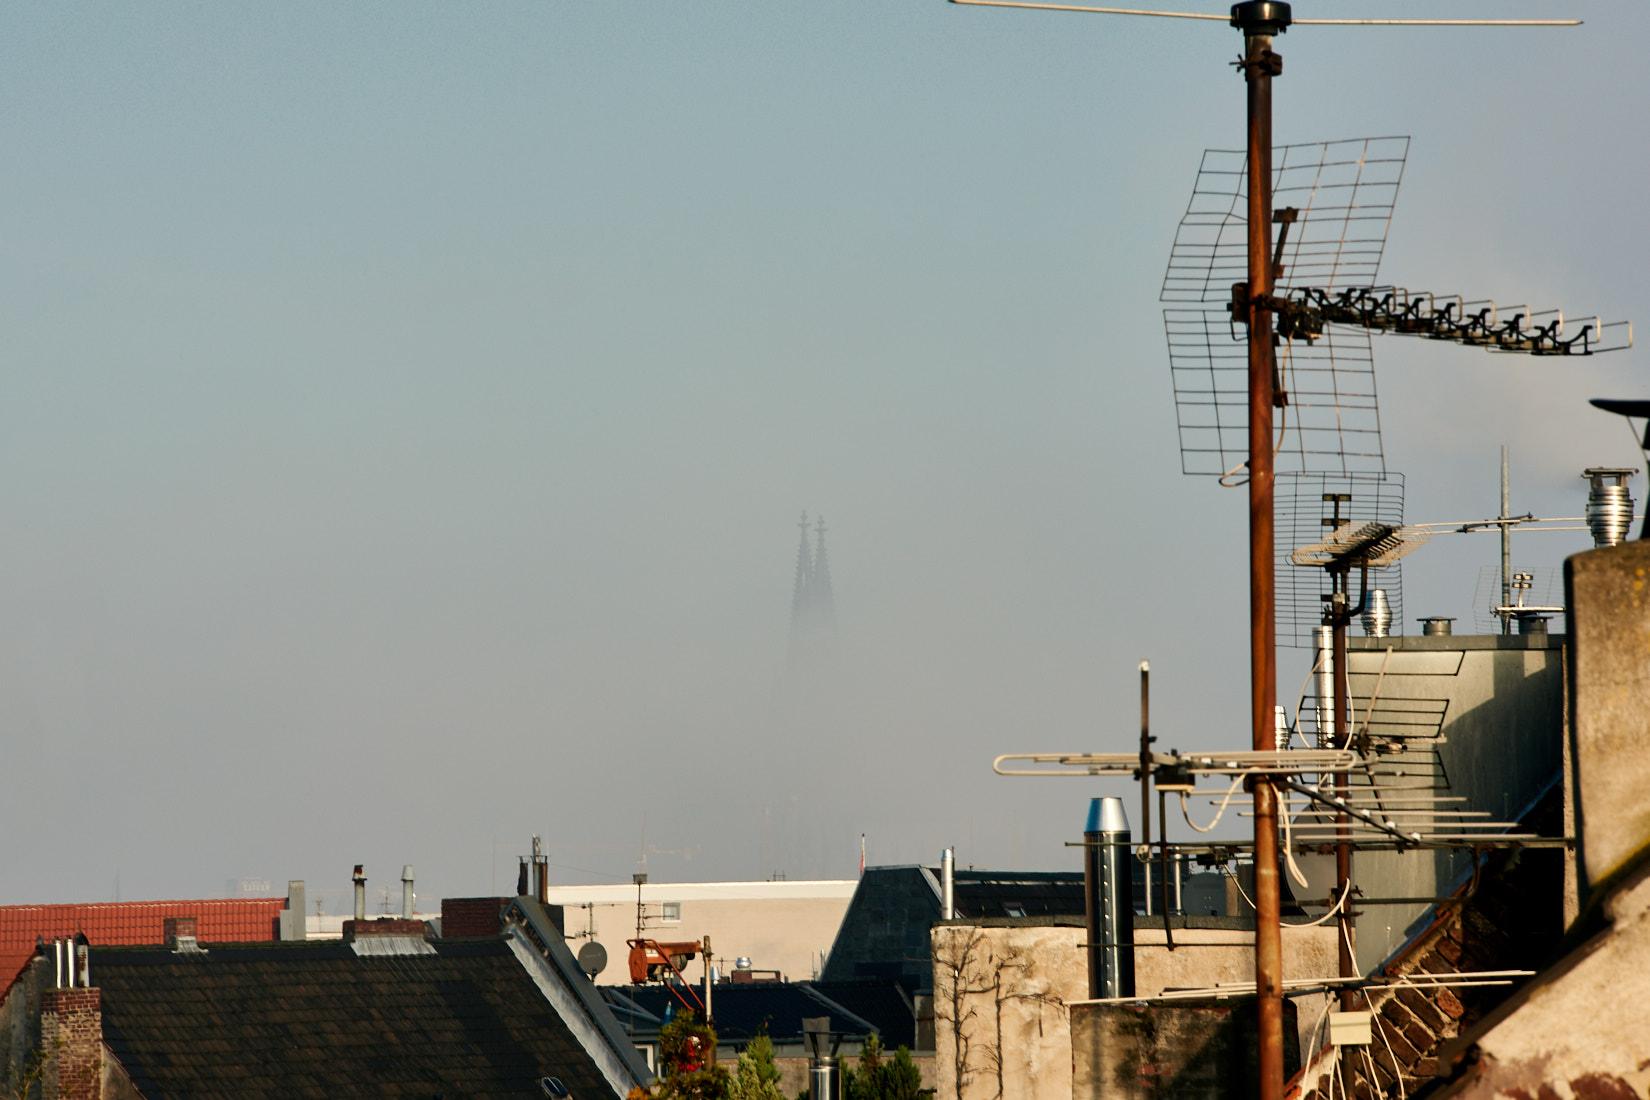 Domspitzen im Nebel | Köln